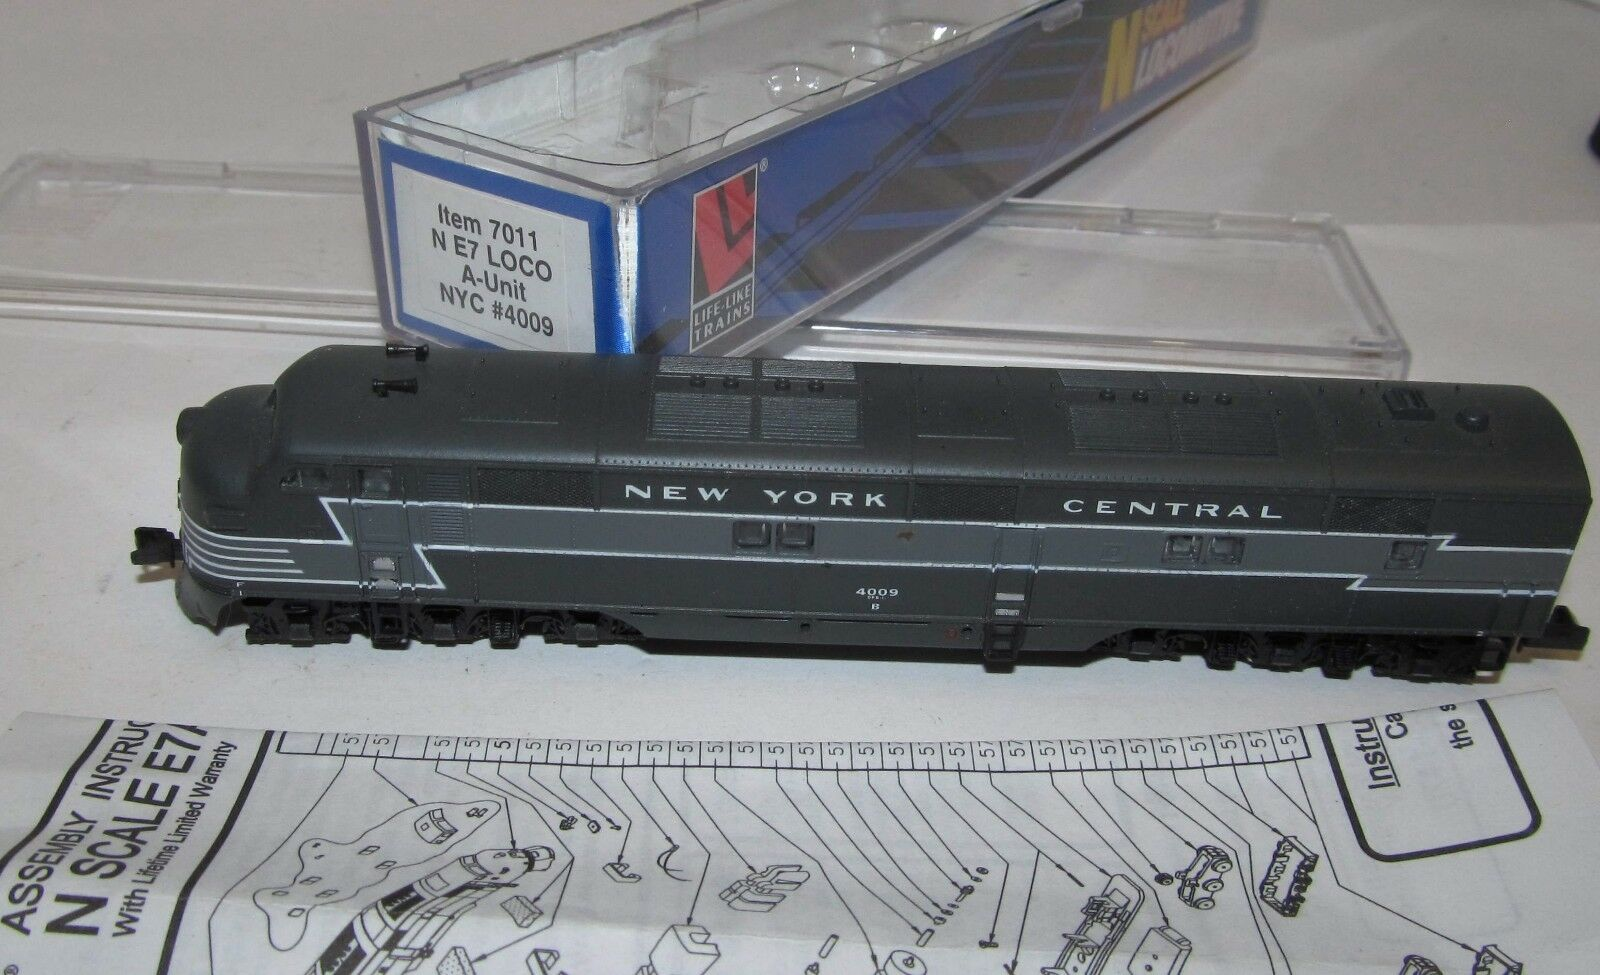 Life-Like Spur N 7011, analoge Diesellok USA NYC 4009, lesen, OVP XR0570X    Attraktive Mode